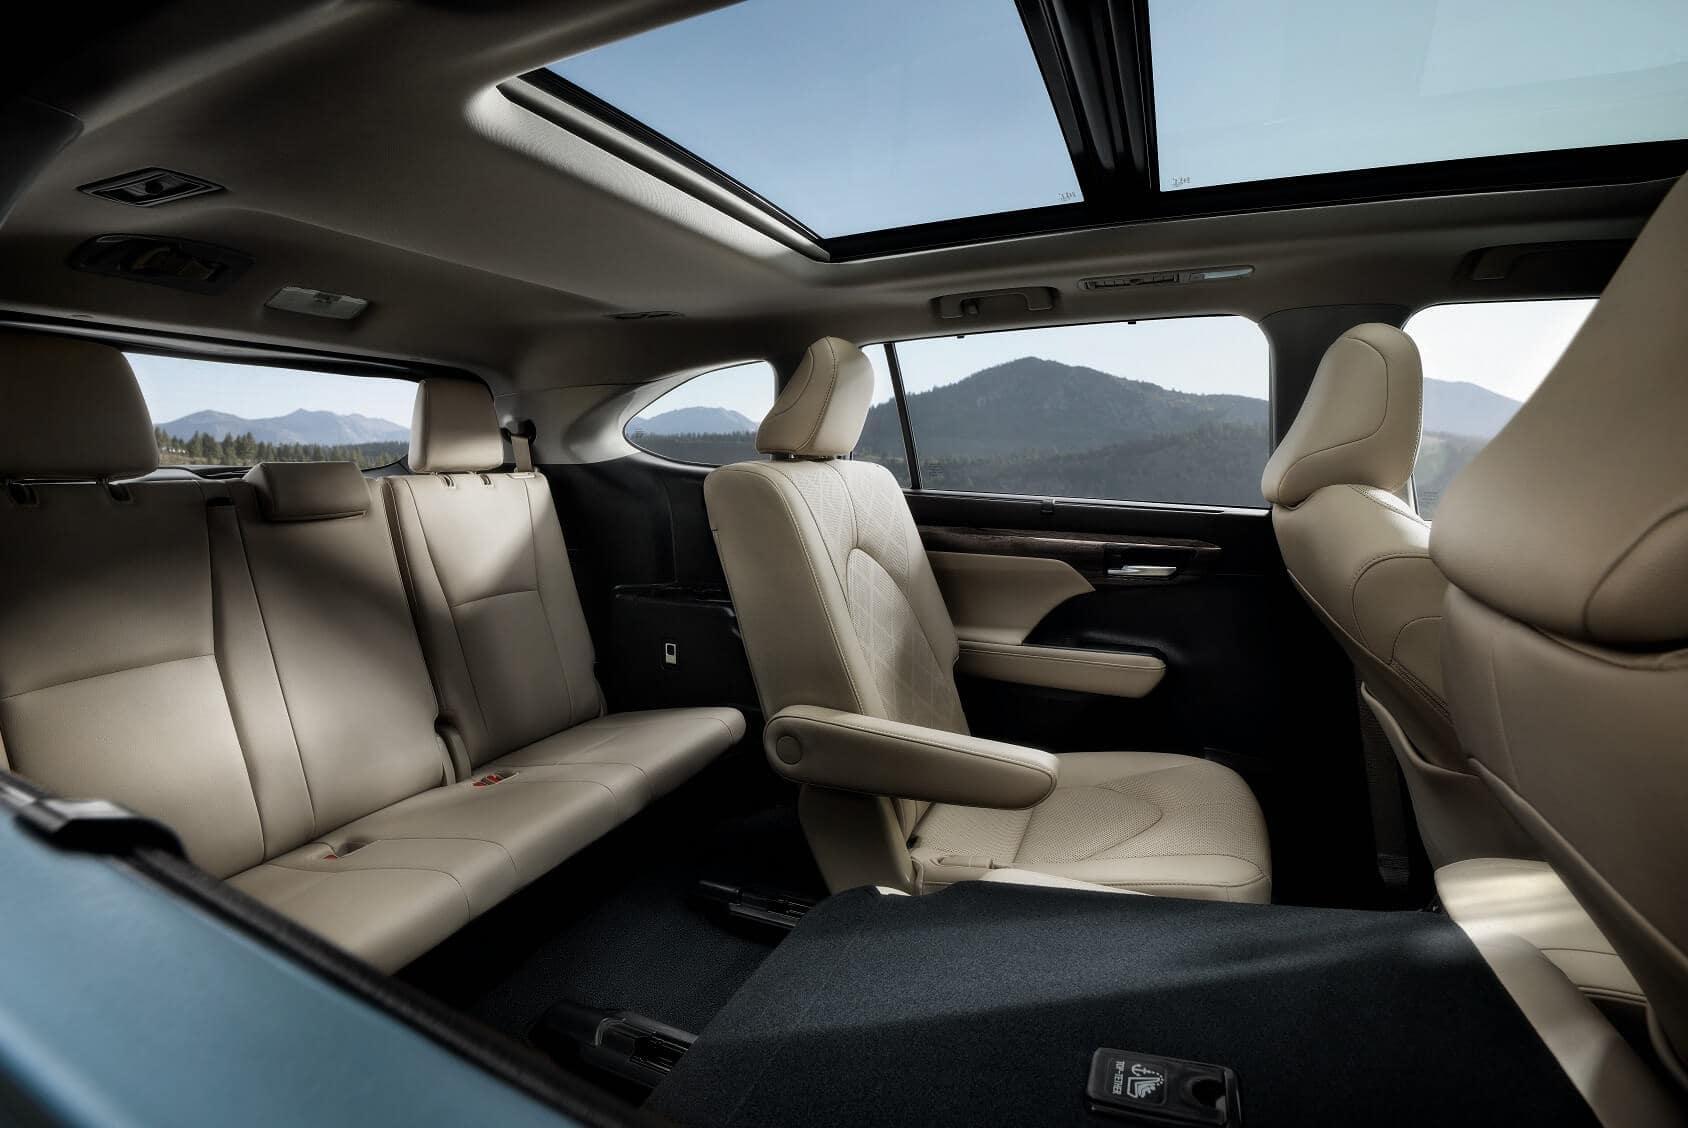 2020 Toyota Highlander Interior Space